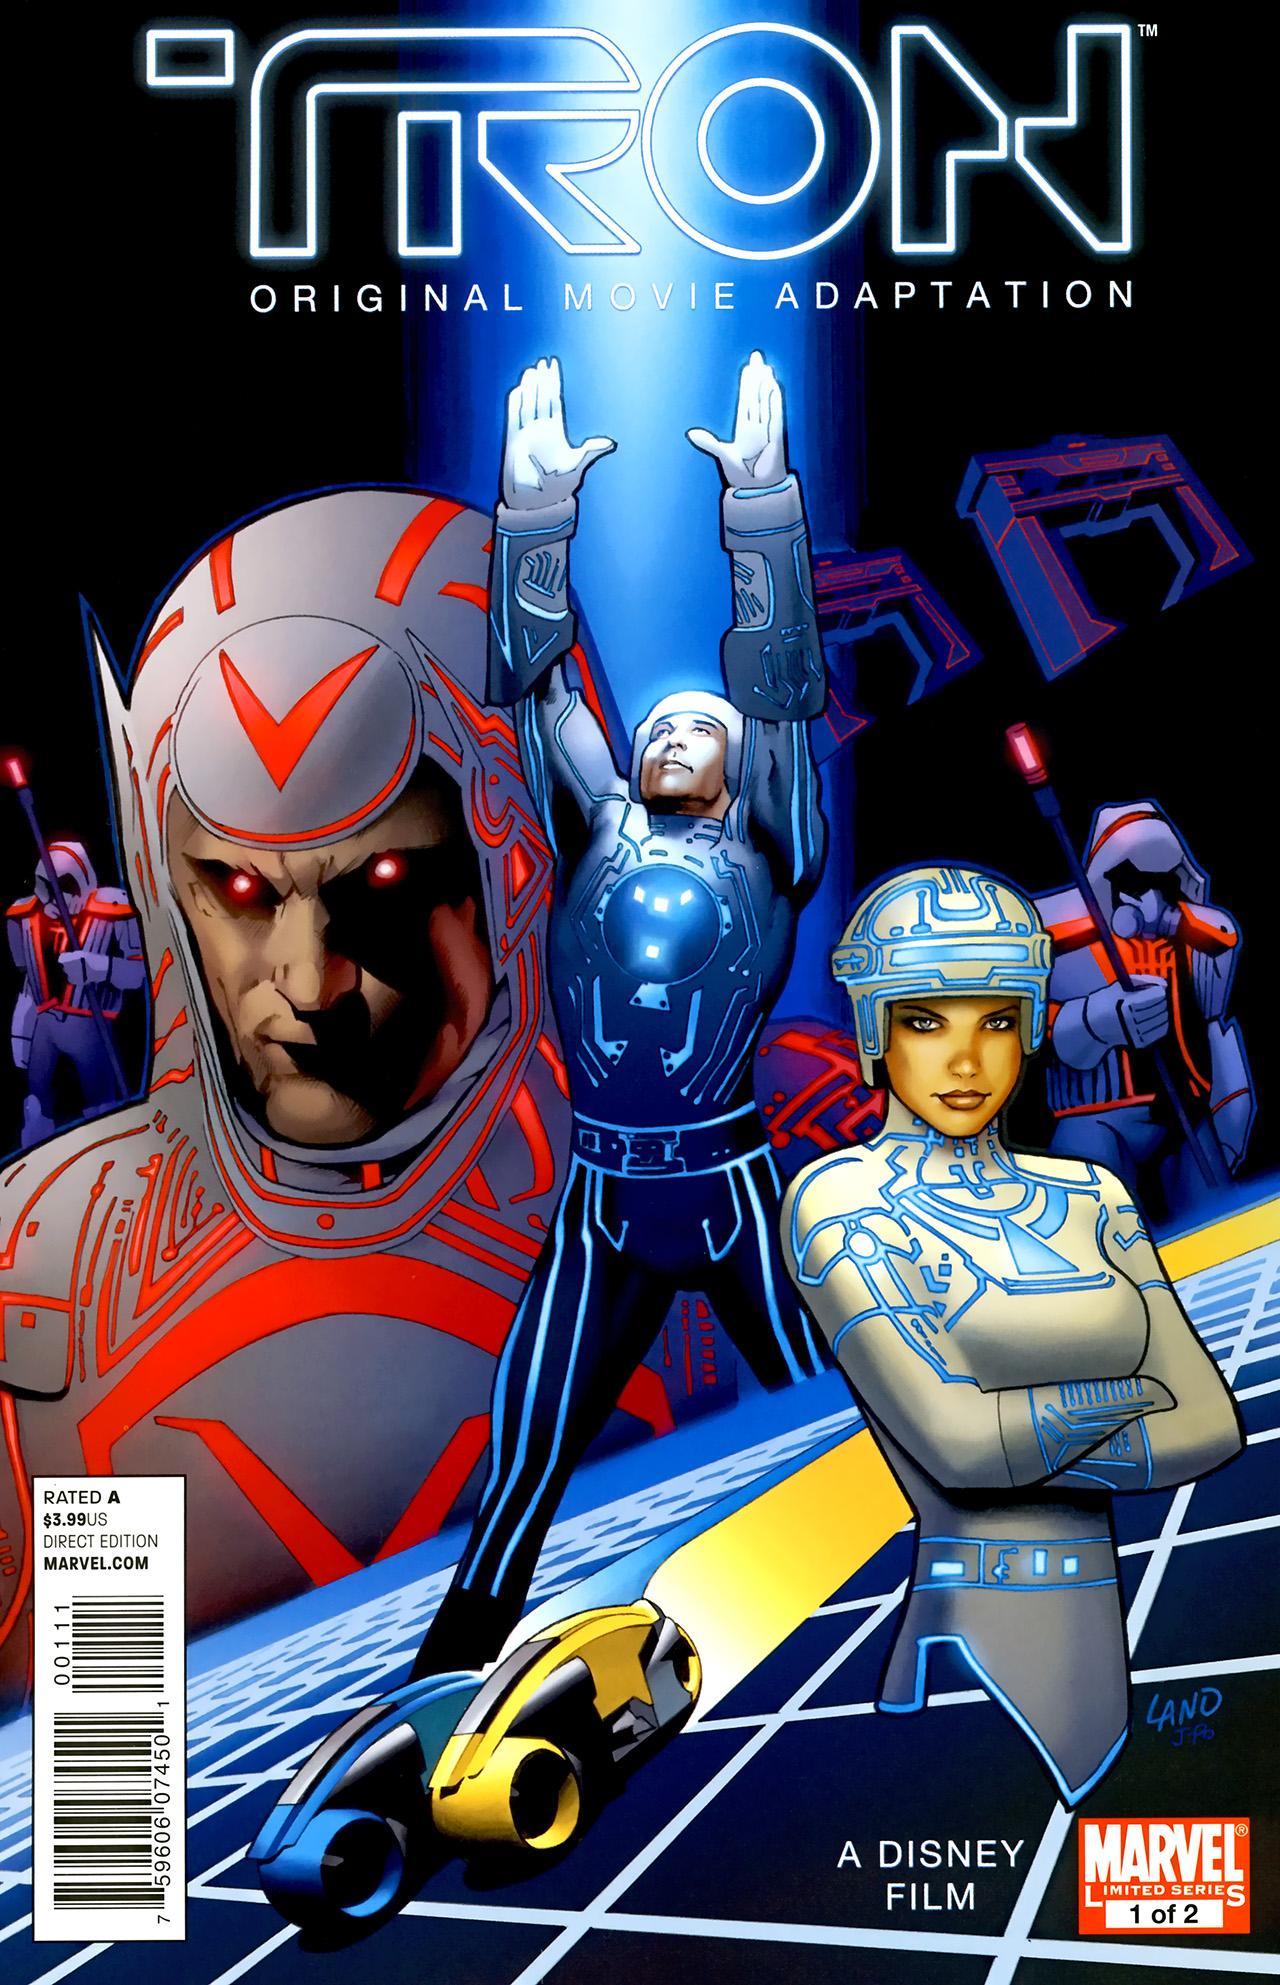 Read online TRON: Original Movie Adaptation comic -  Issue #1 - 1